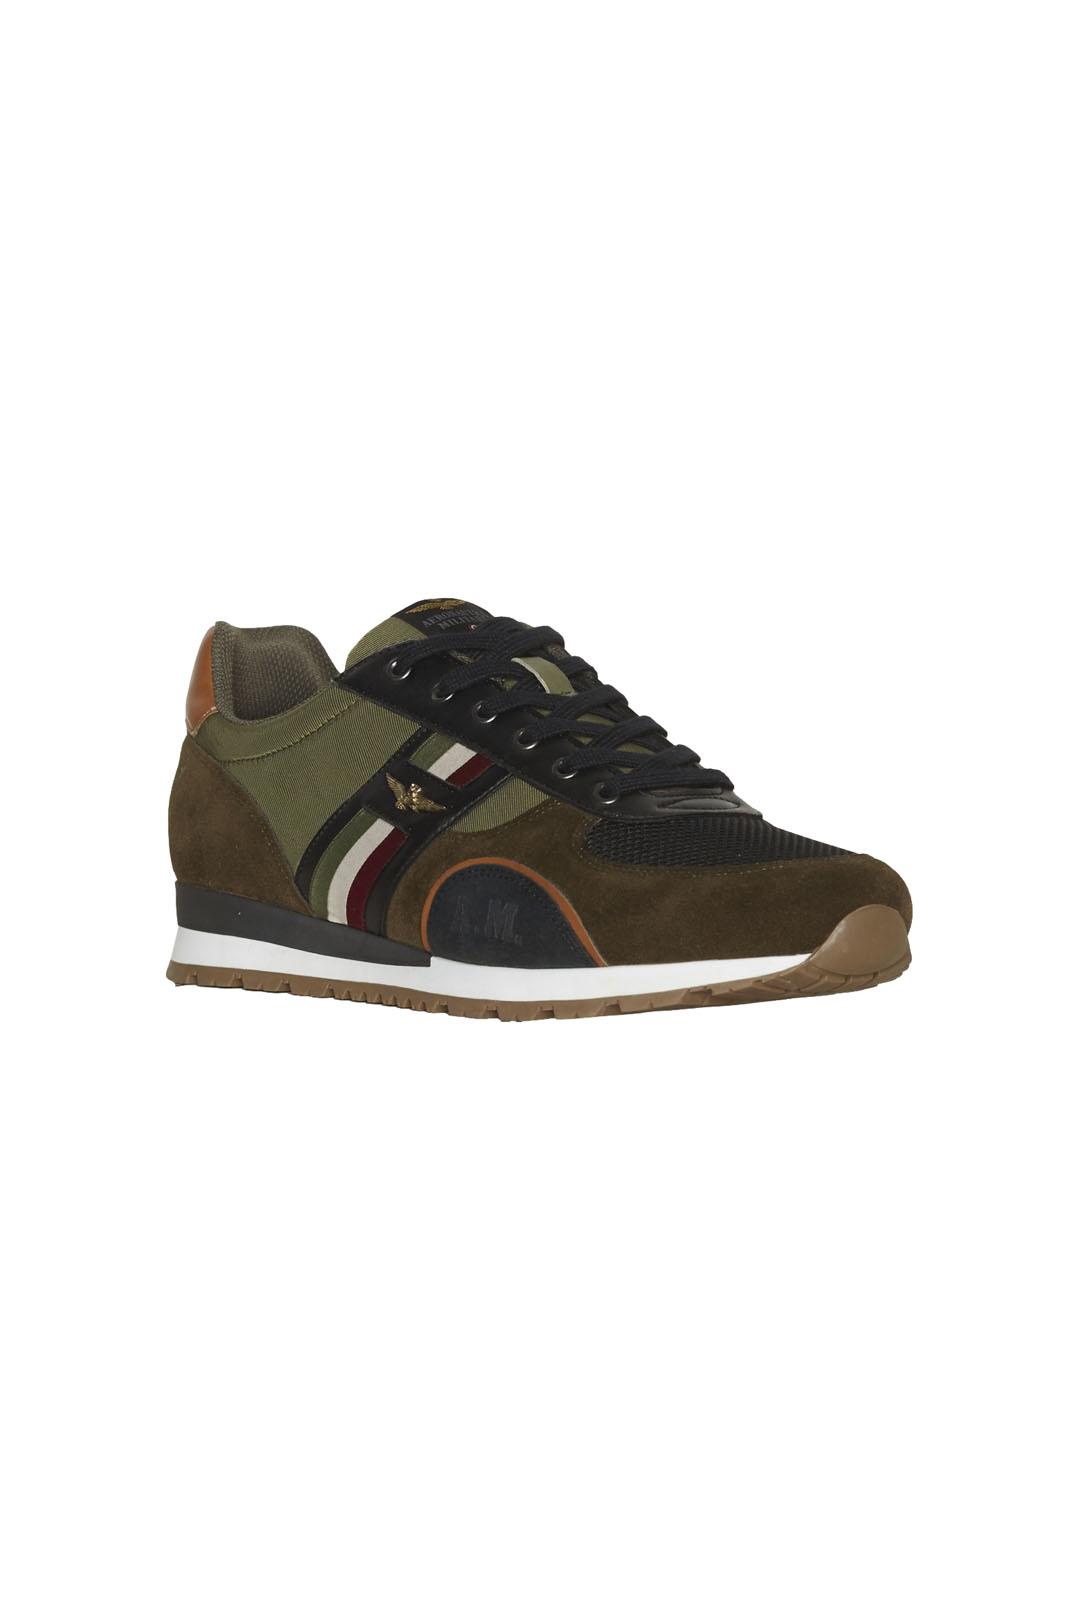 Sneakers avec tricolore